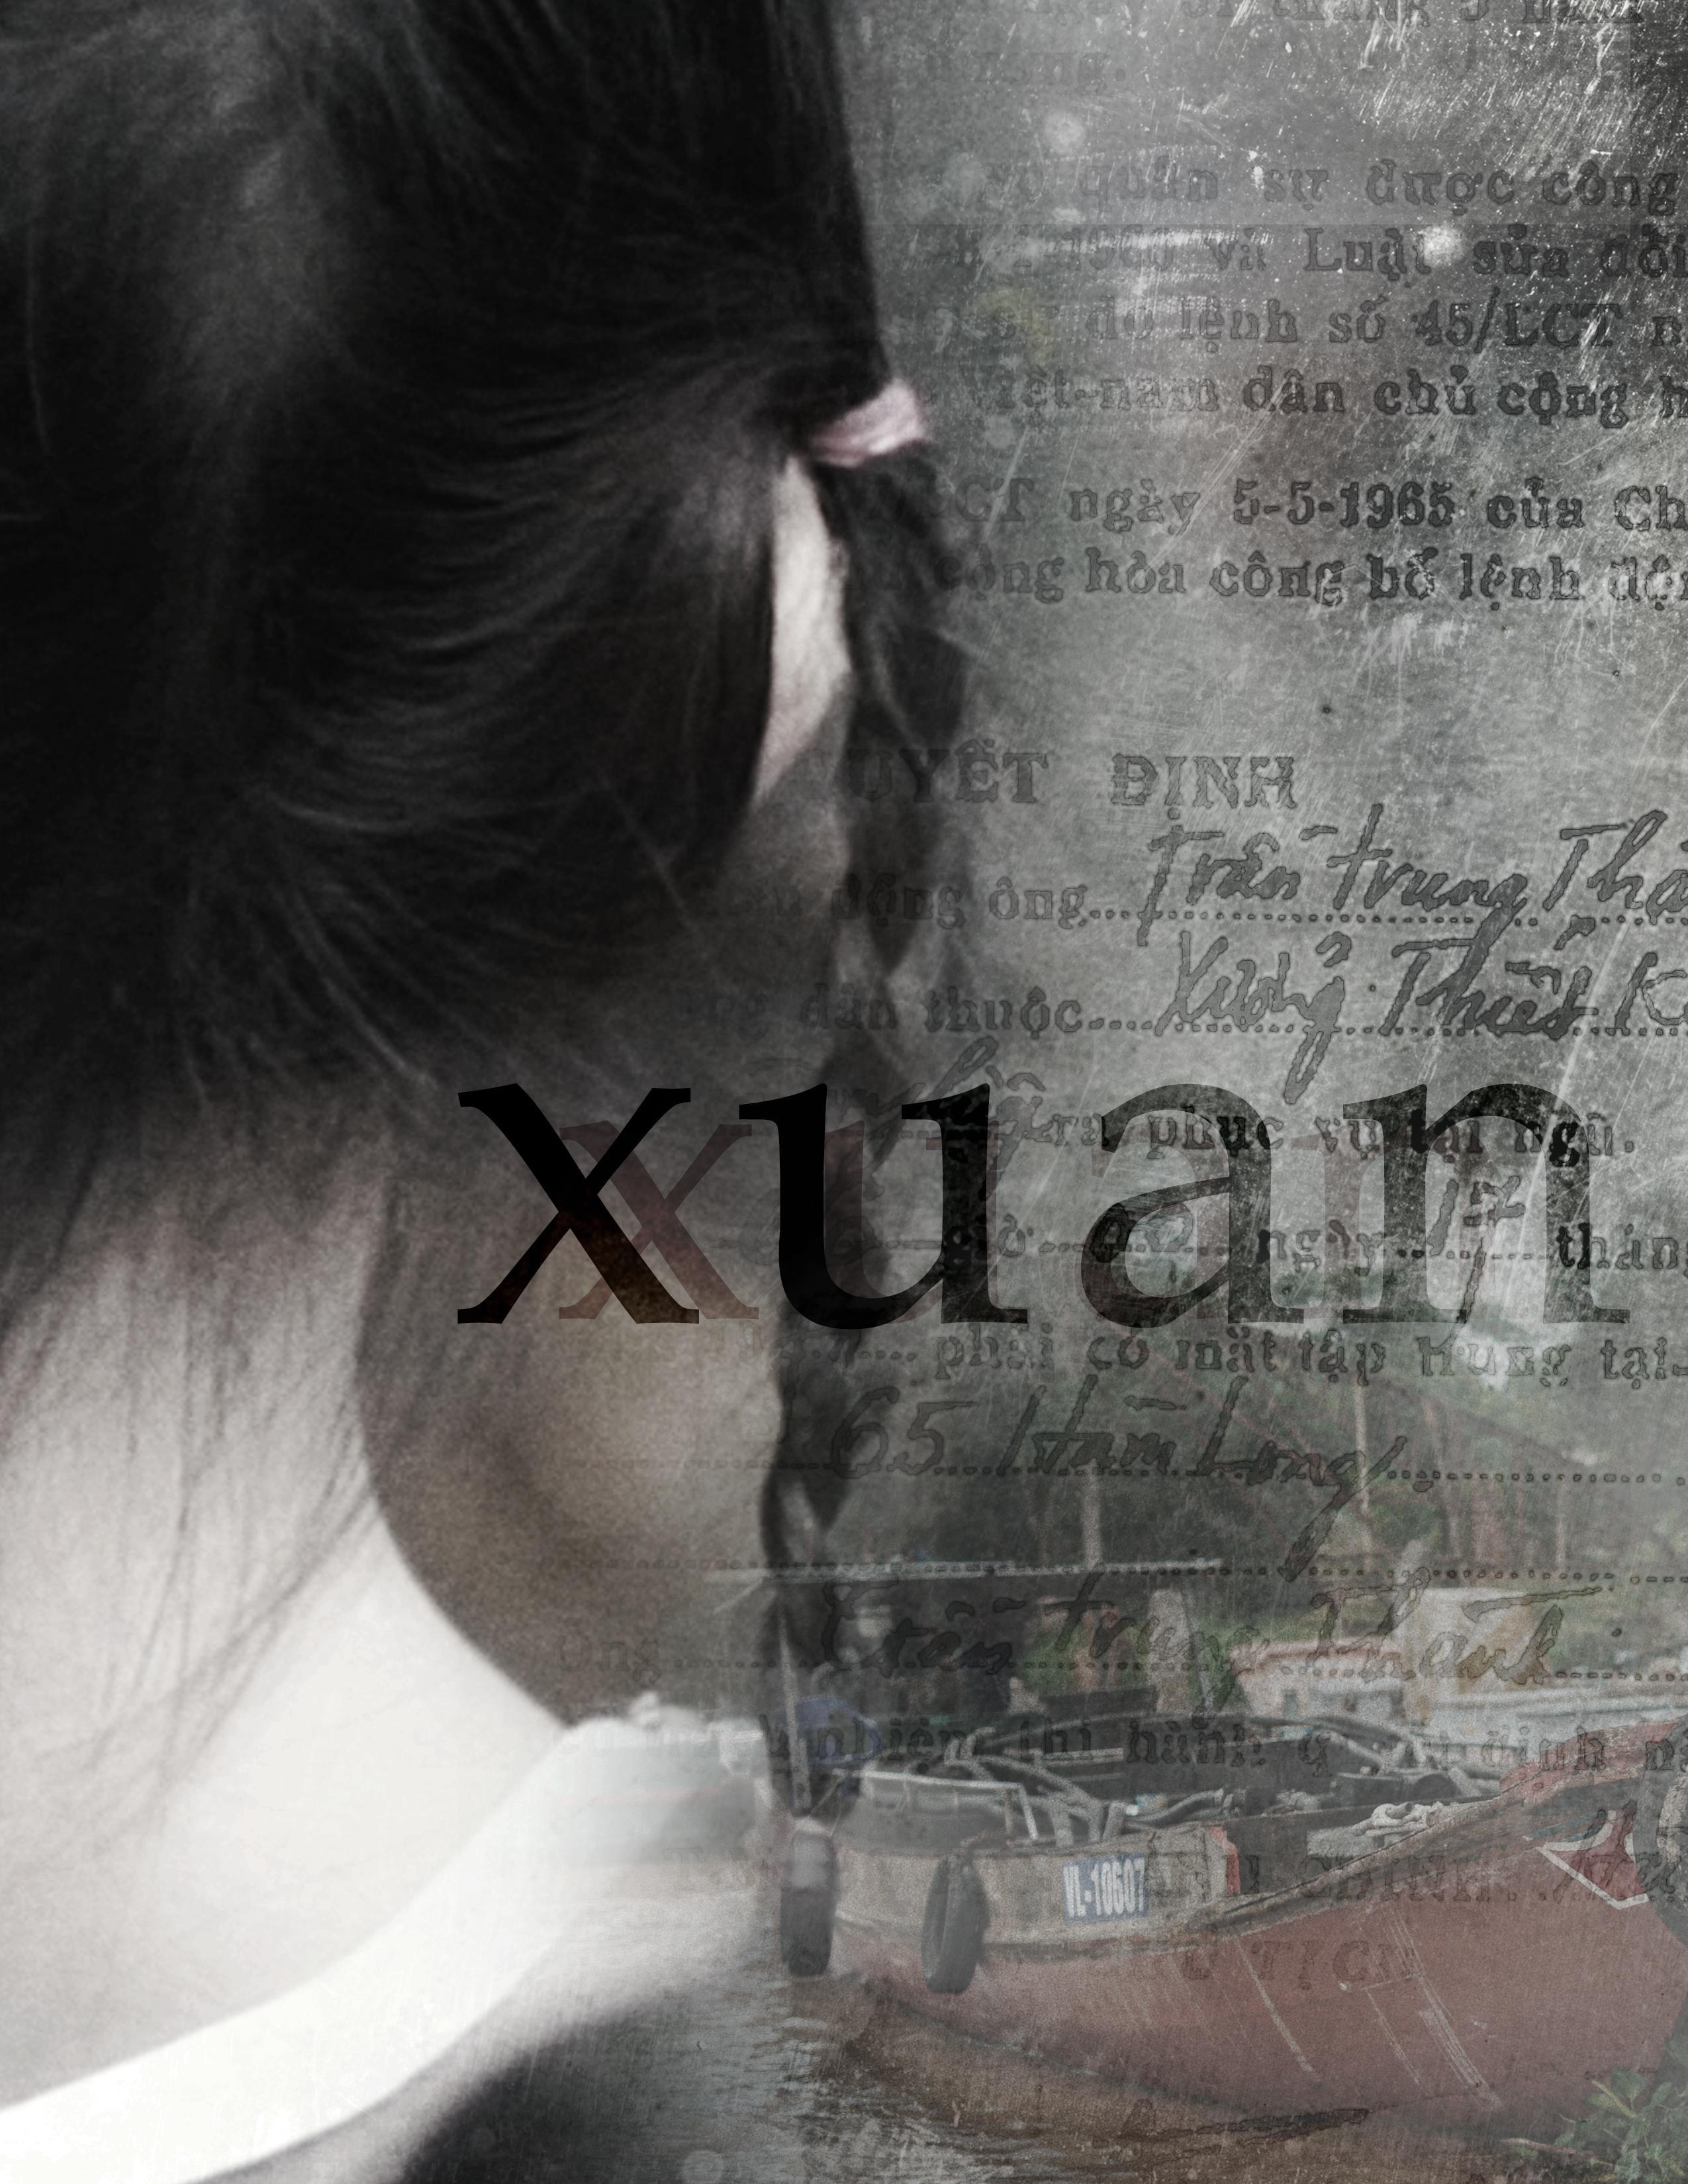 دانلود زیرنویس فارسی فیلم Xuan